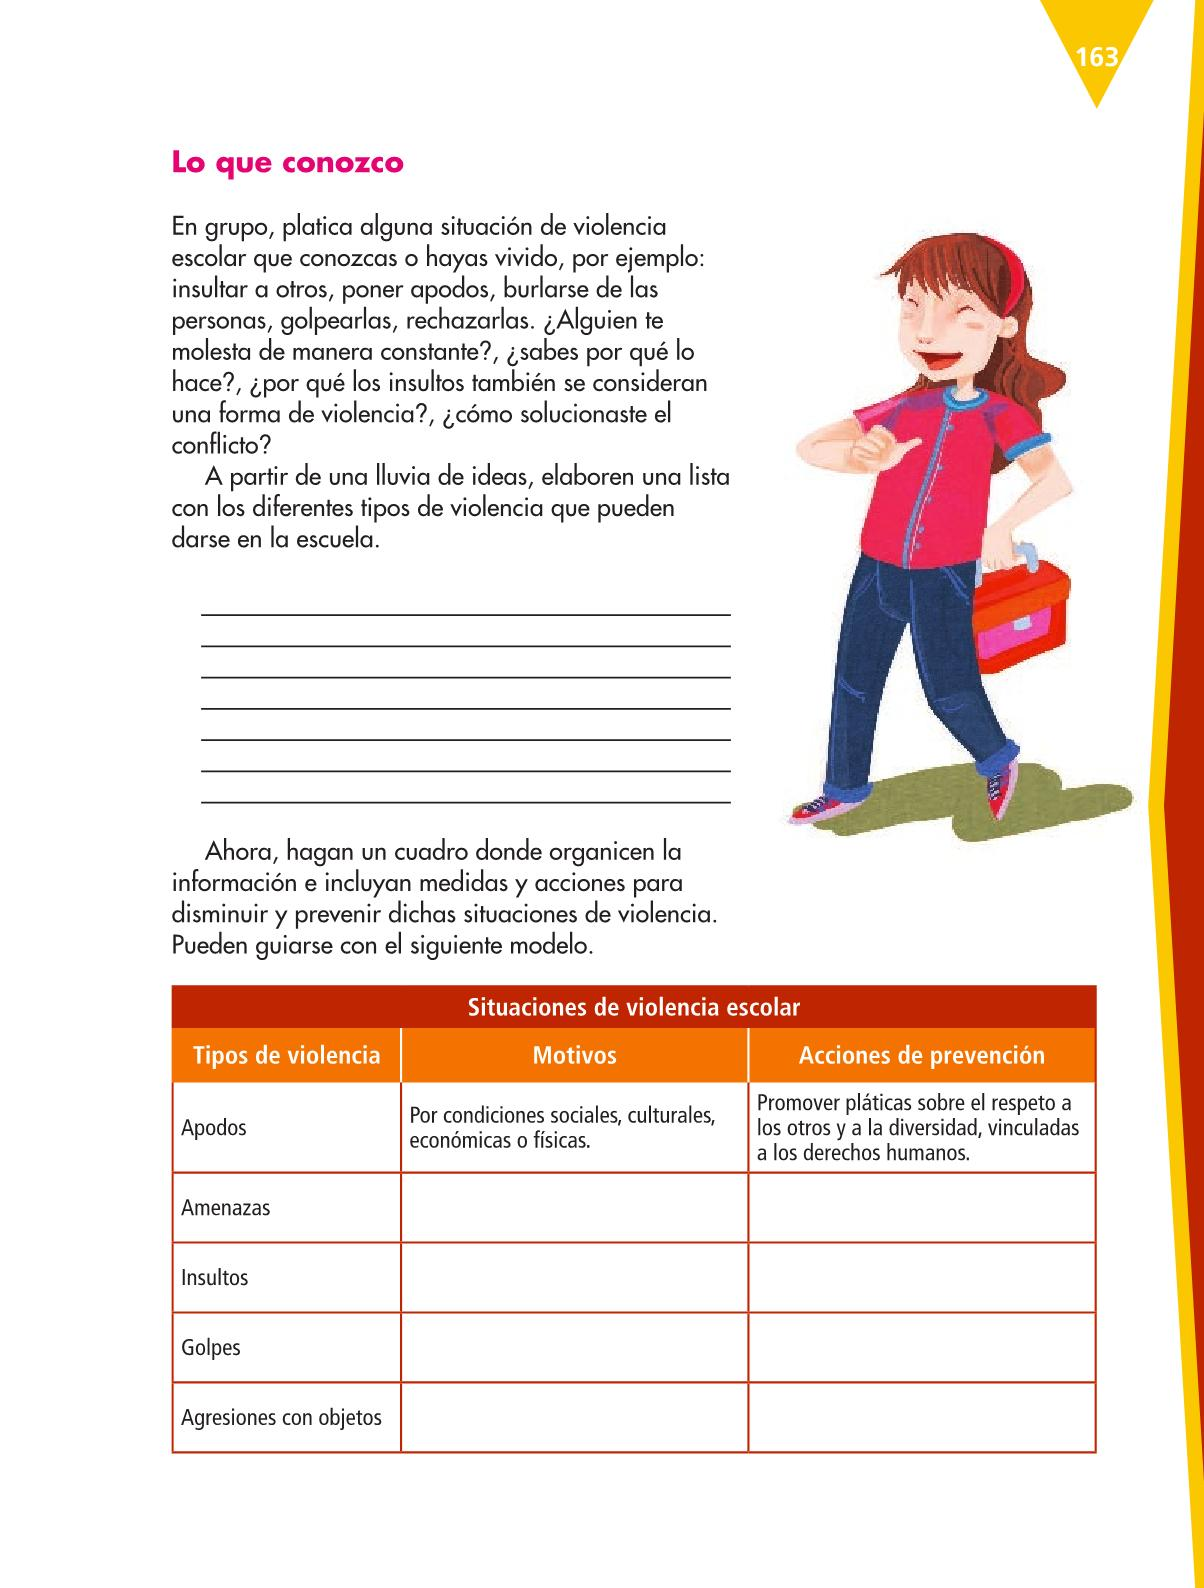 Español Libro para el alumnoquintoPagina 163